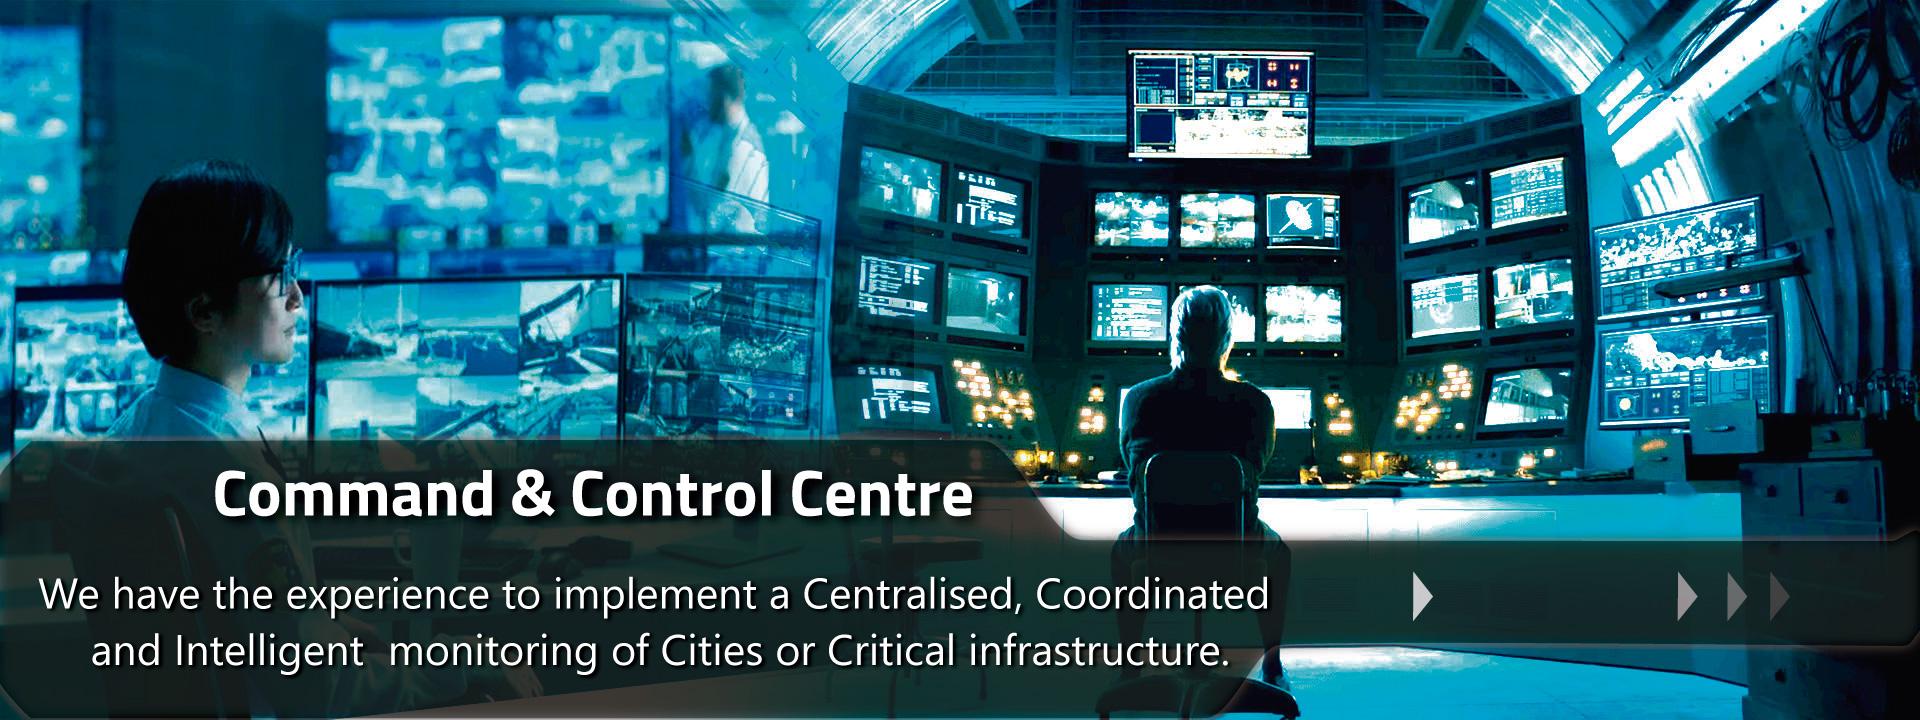 command-control-center